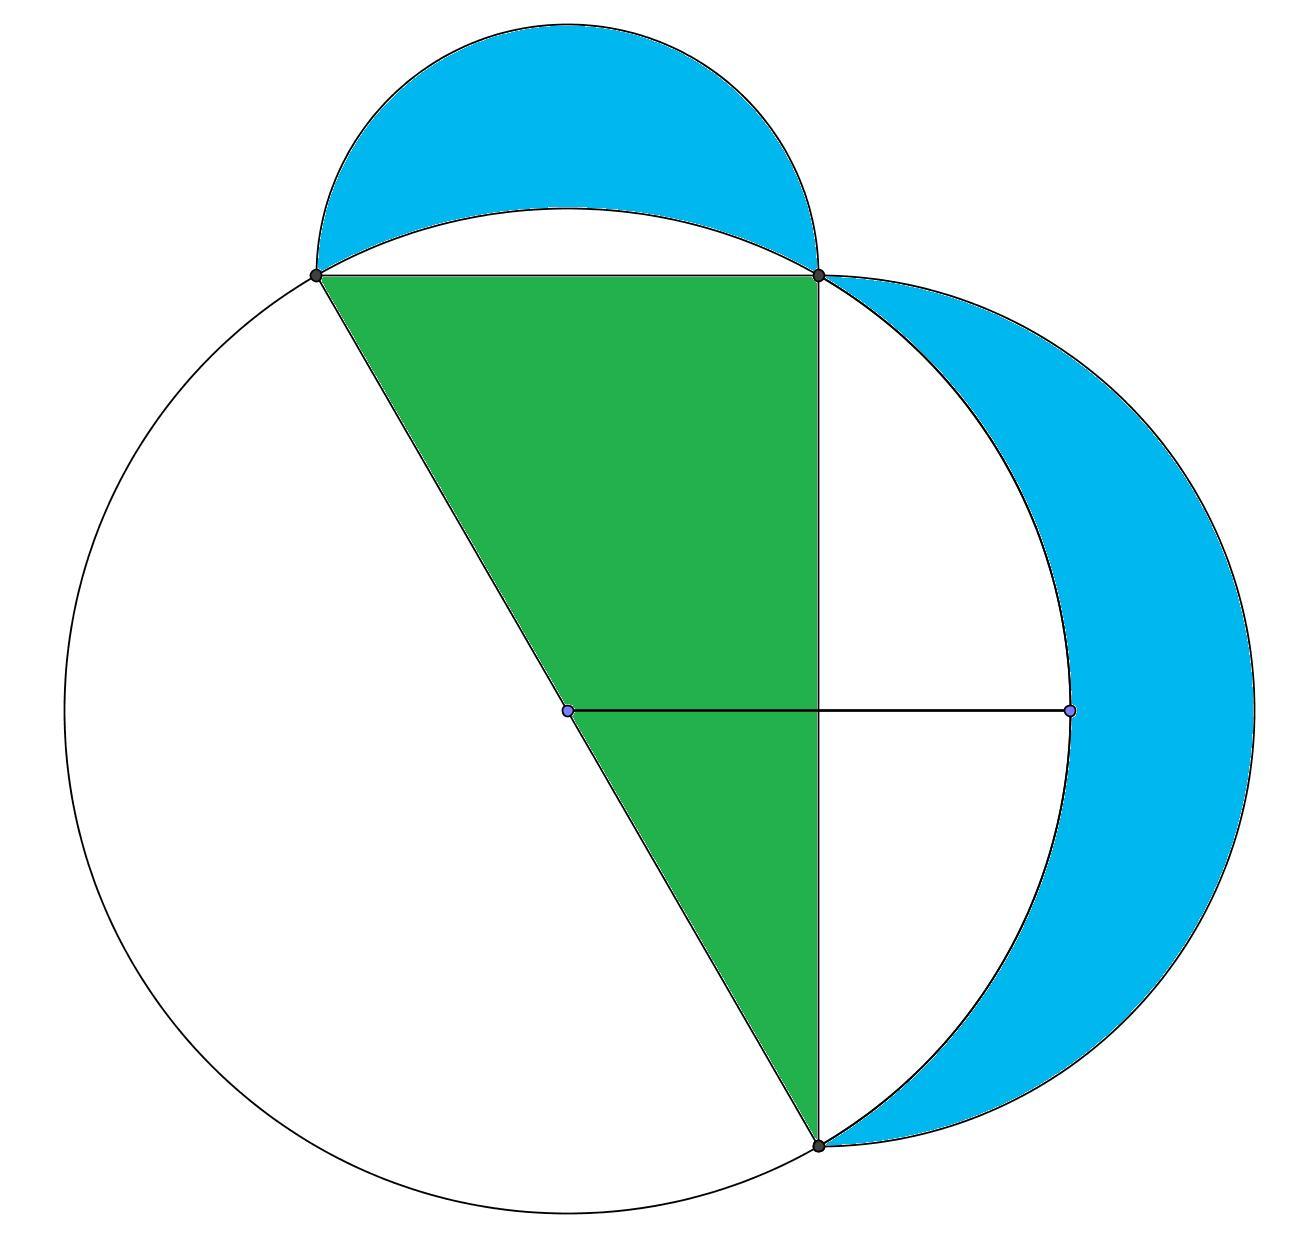 http://www.prise2tete.fr/upload/schaff60-lunule2.jpg